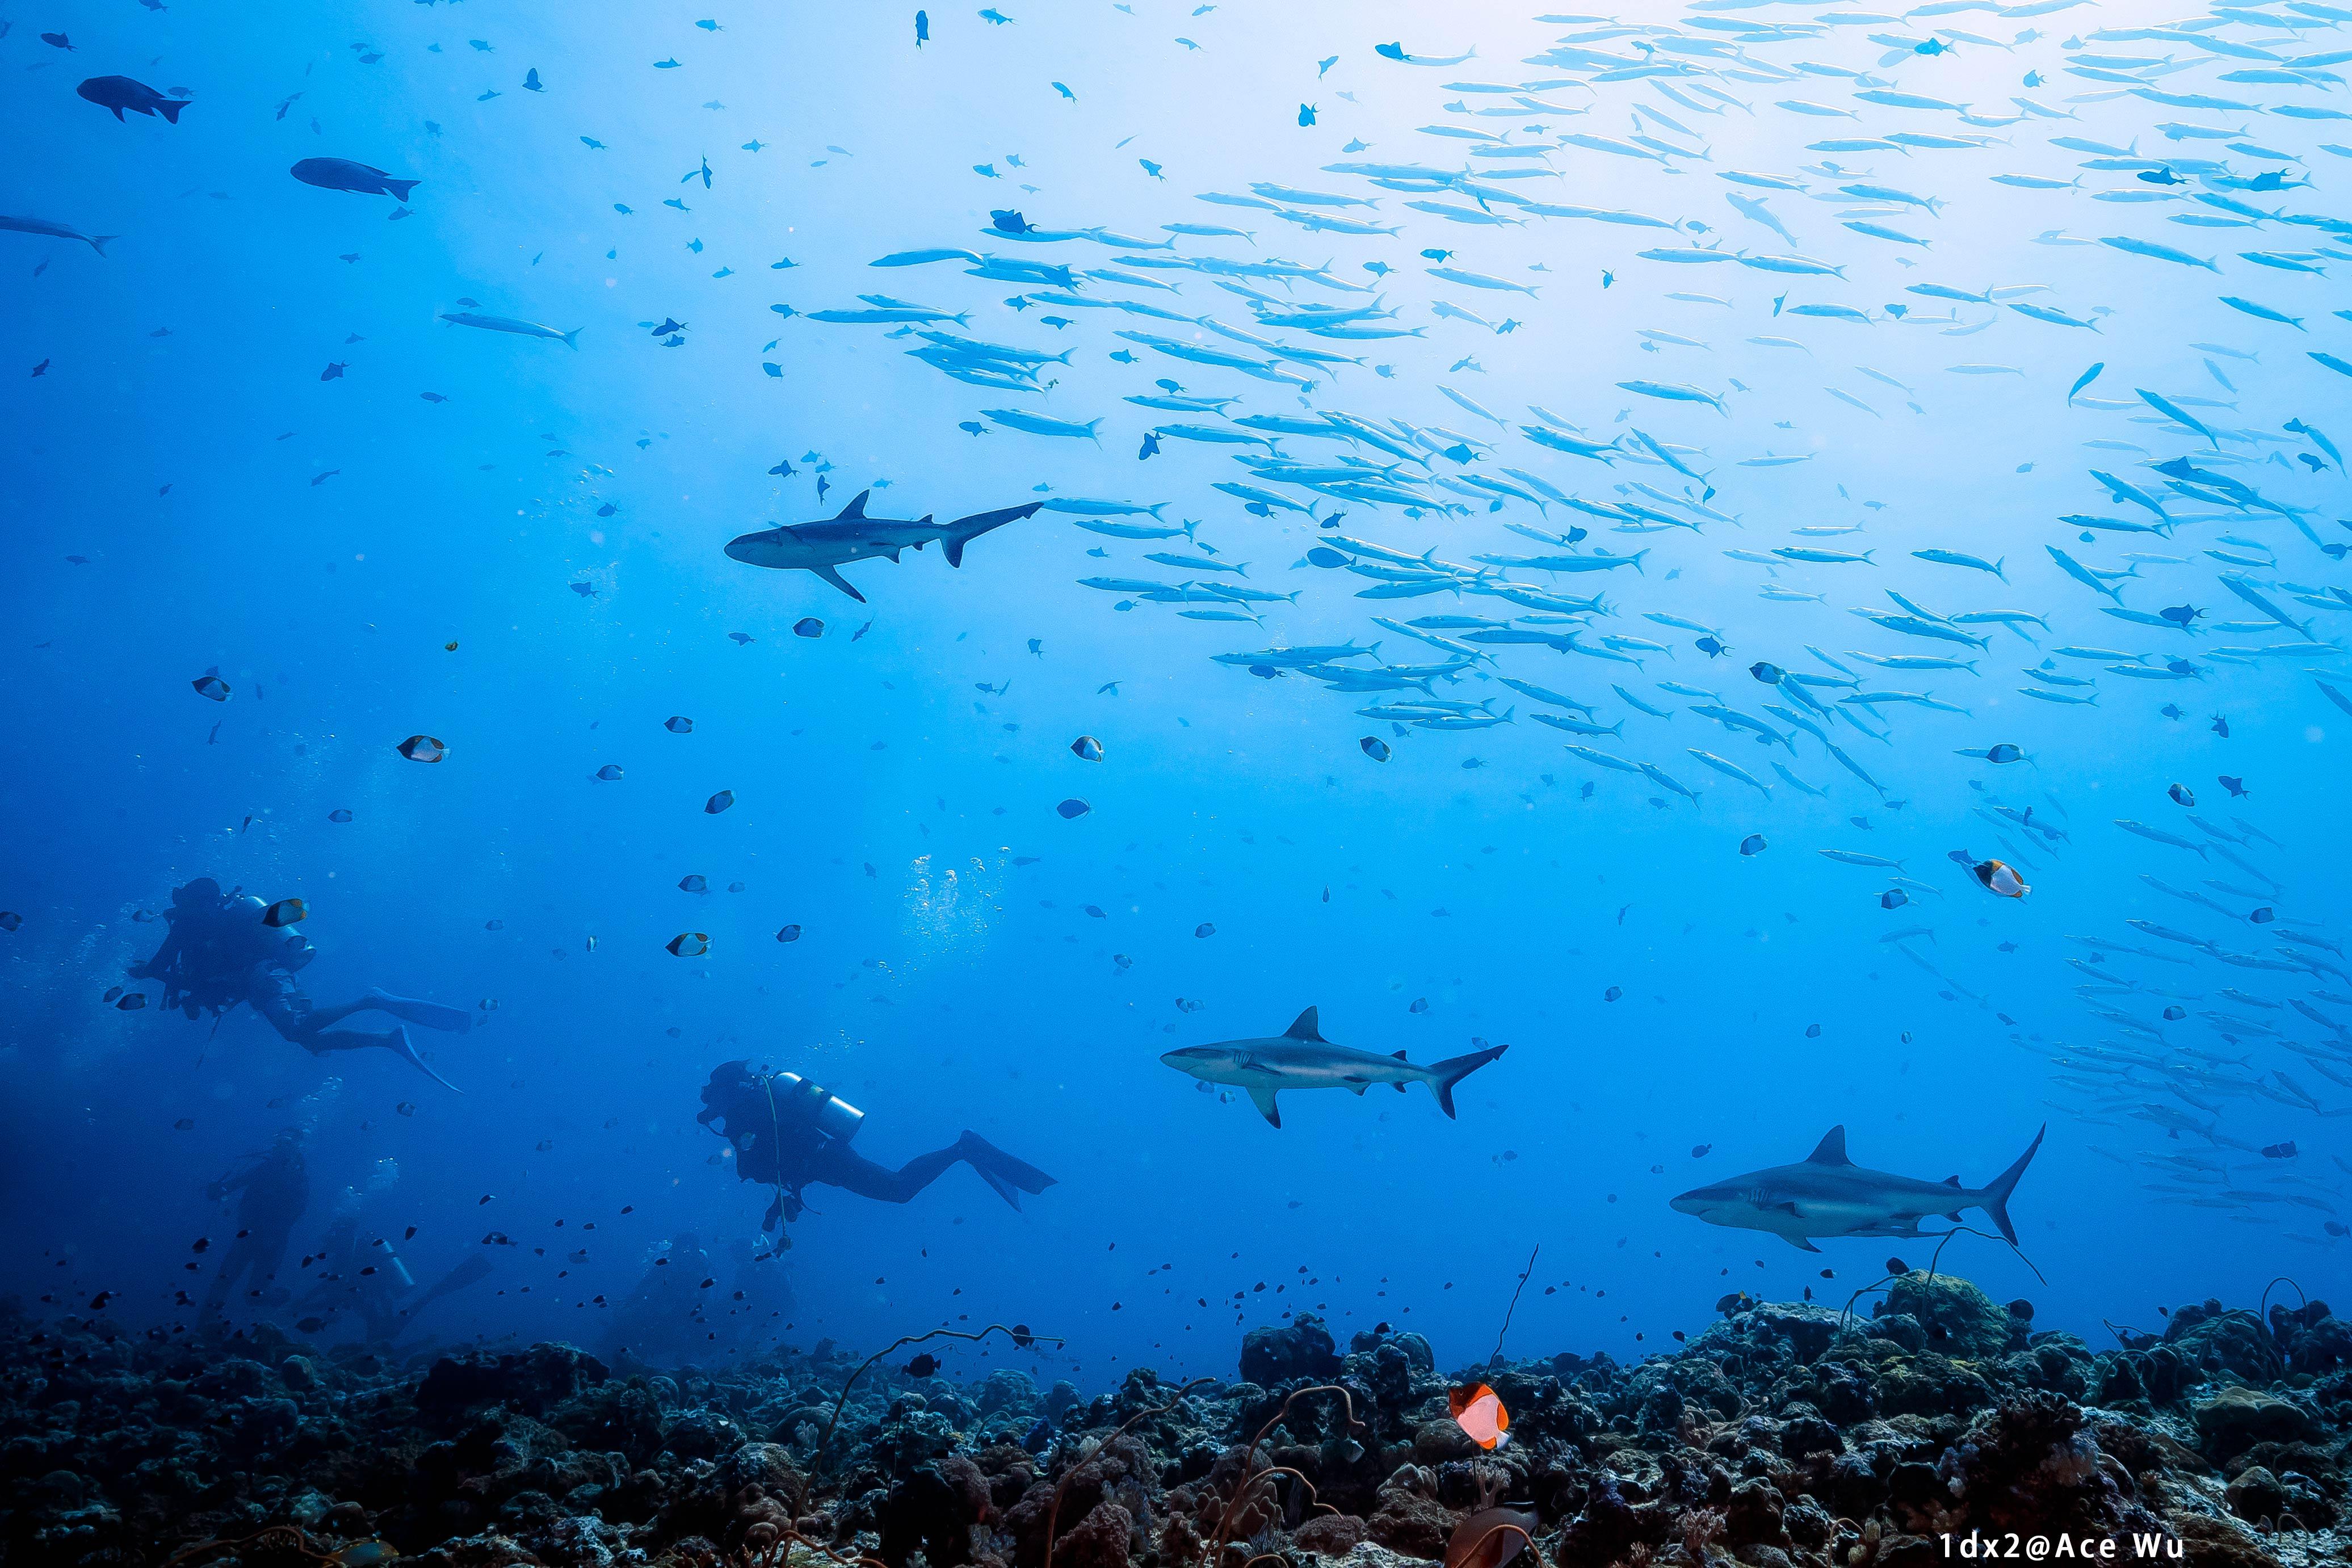 Palau's underwater seascape